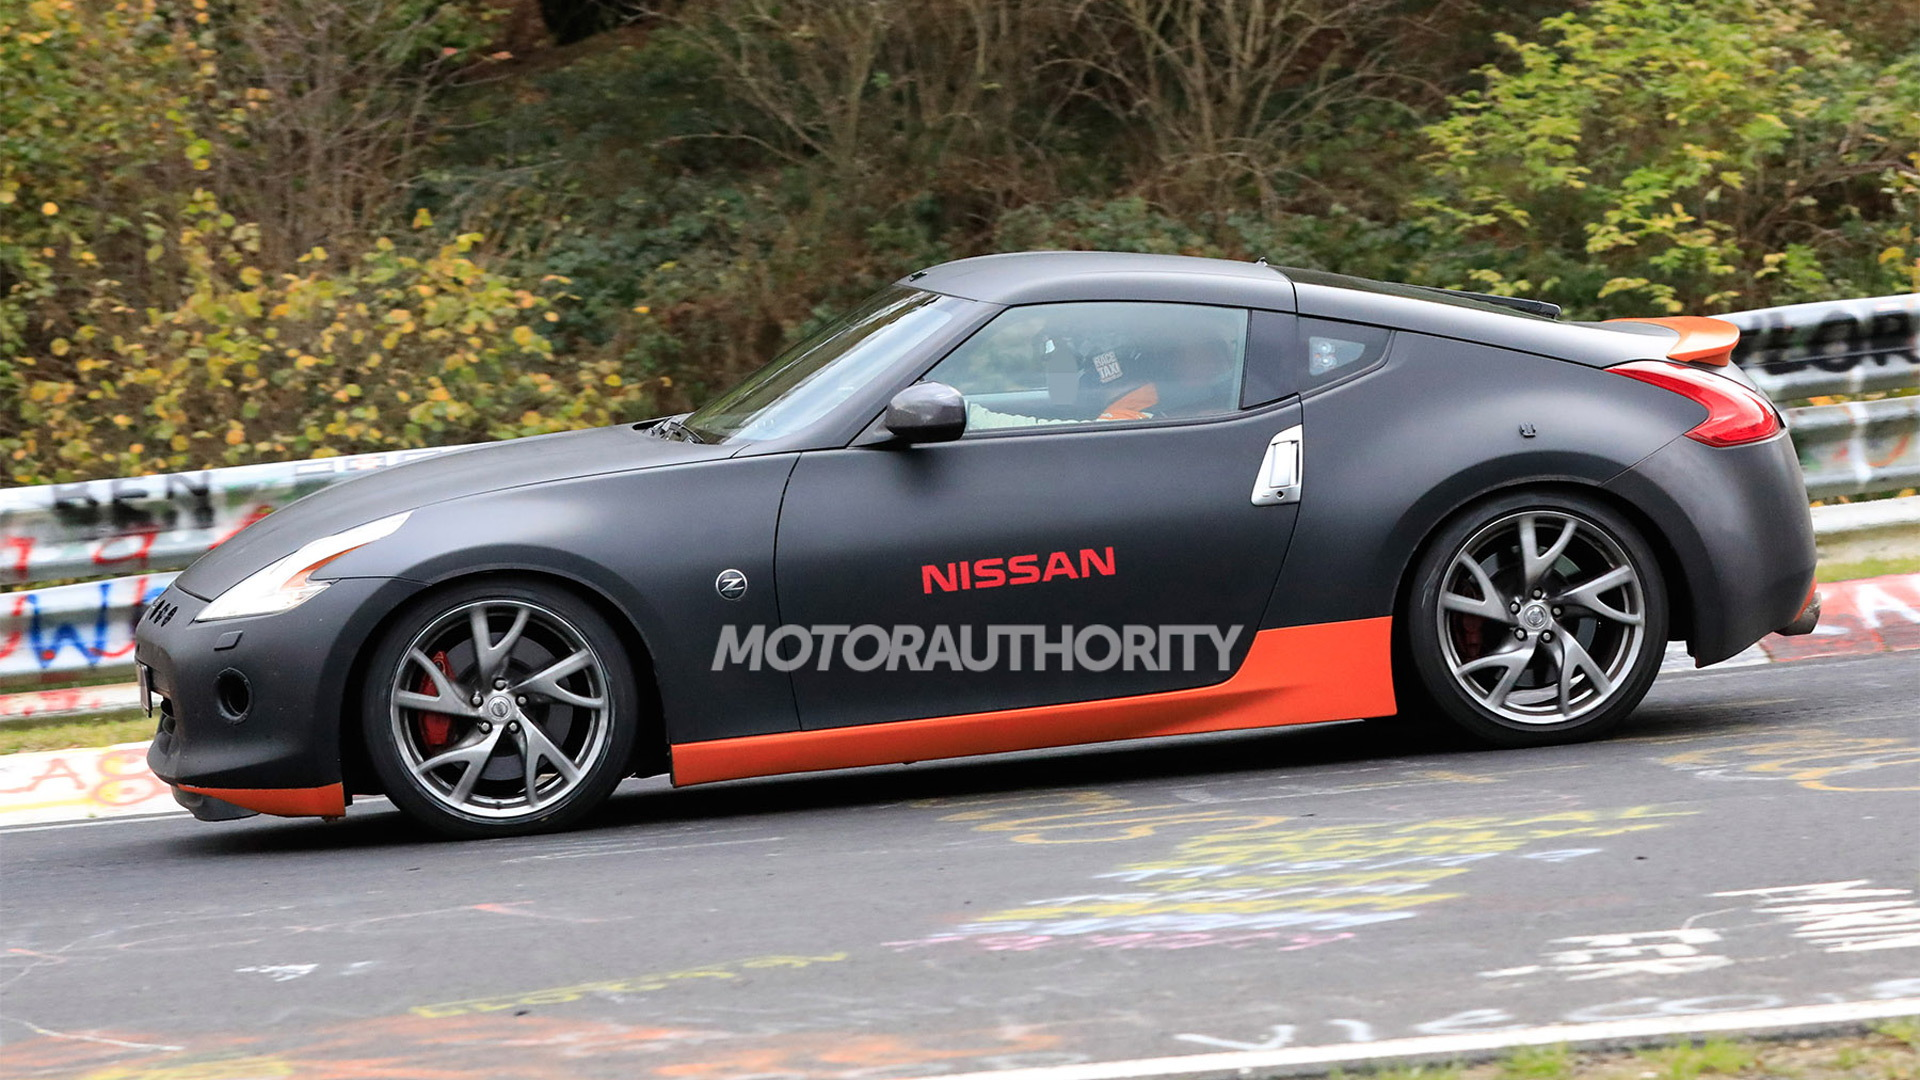 2022 Nissan Z sports car test mule spy shots - Photo credit: S. Baldauf/SB-Medien